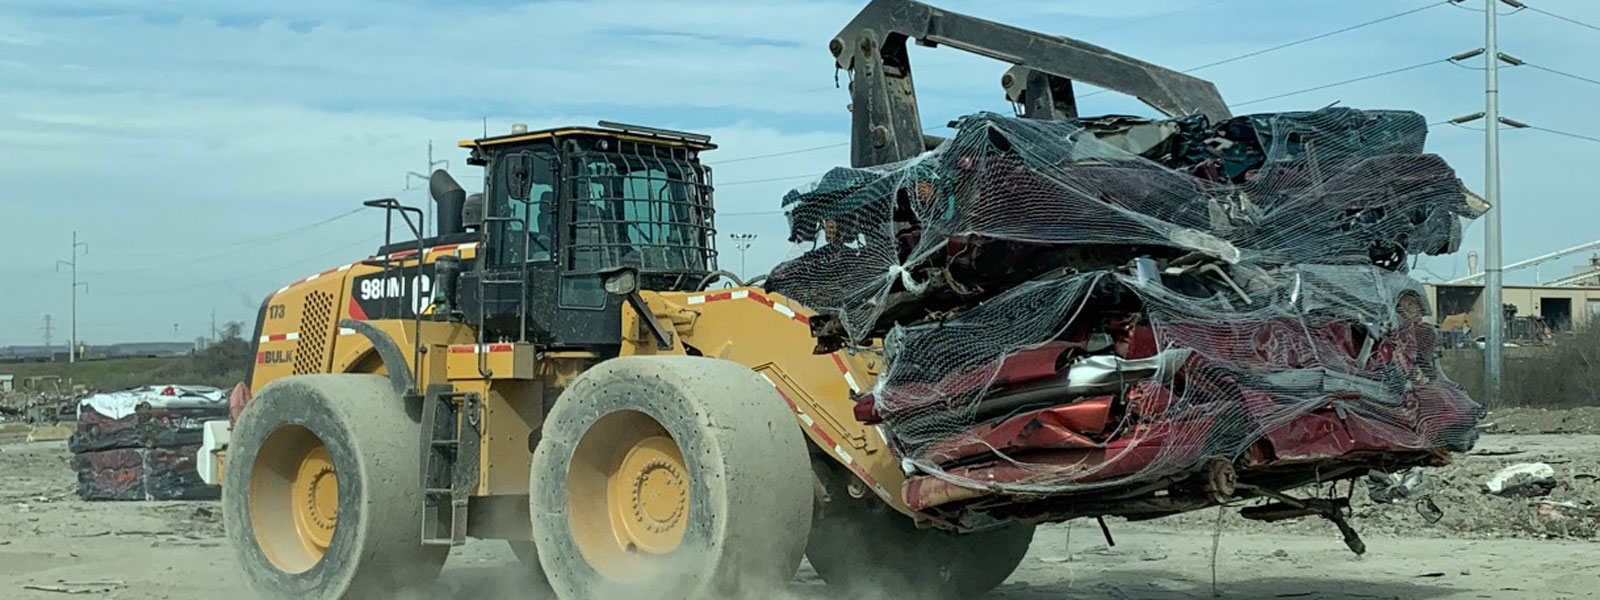 Cat® Bulldozer Hauling Car Scraps At Scrap Recyling Center